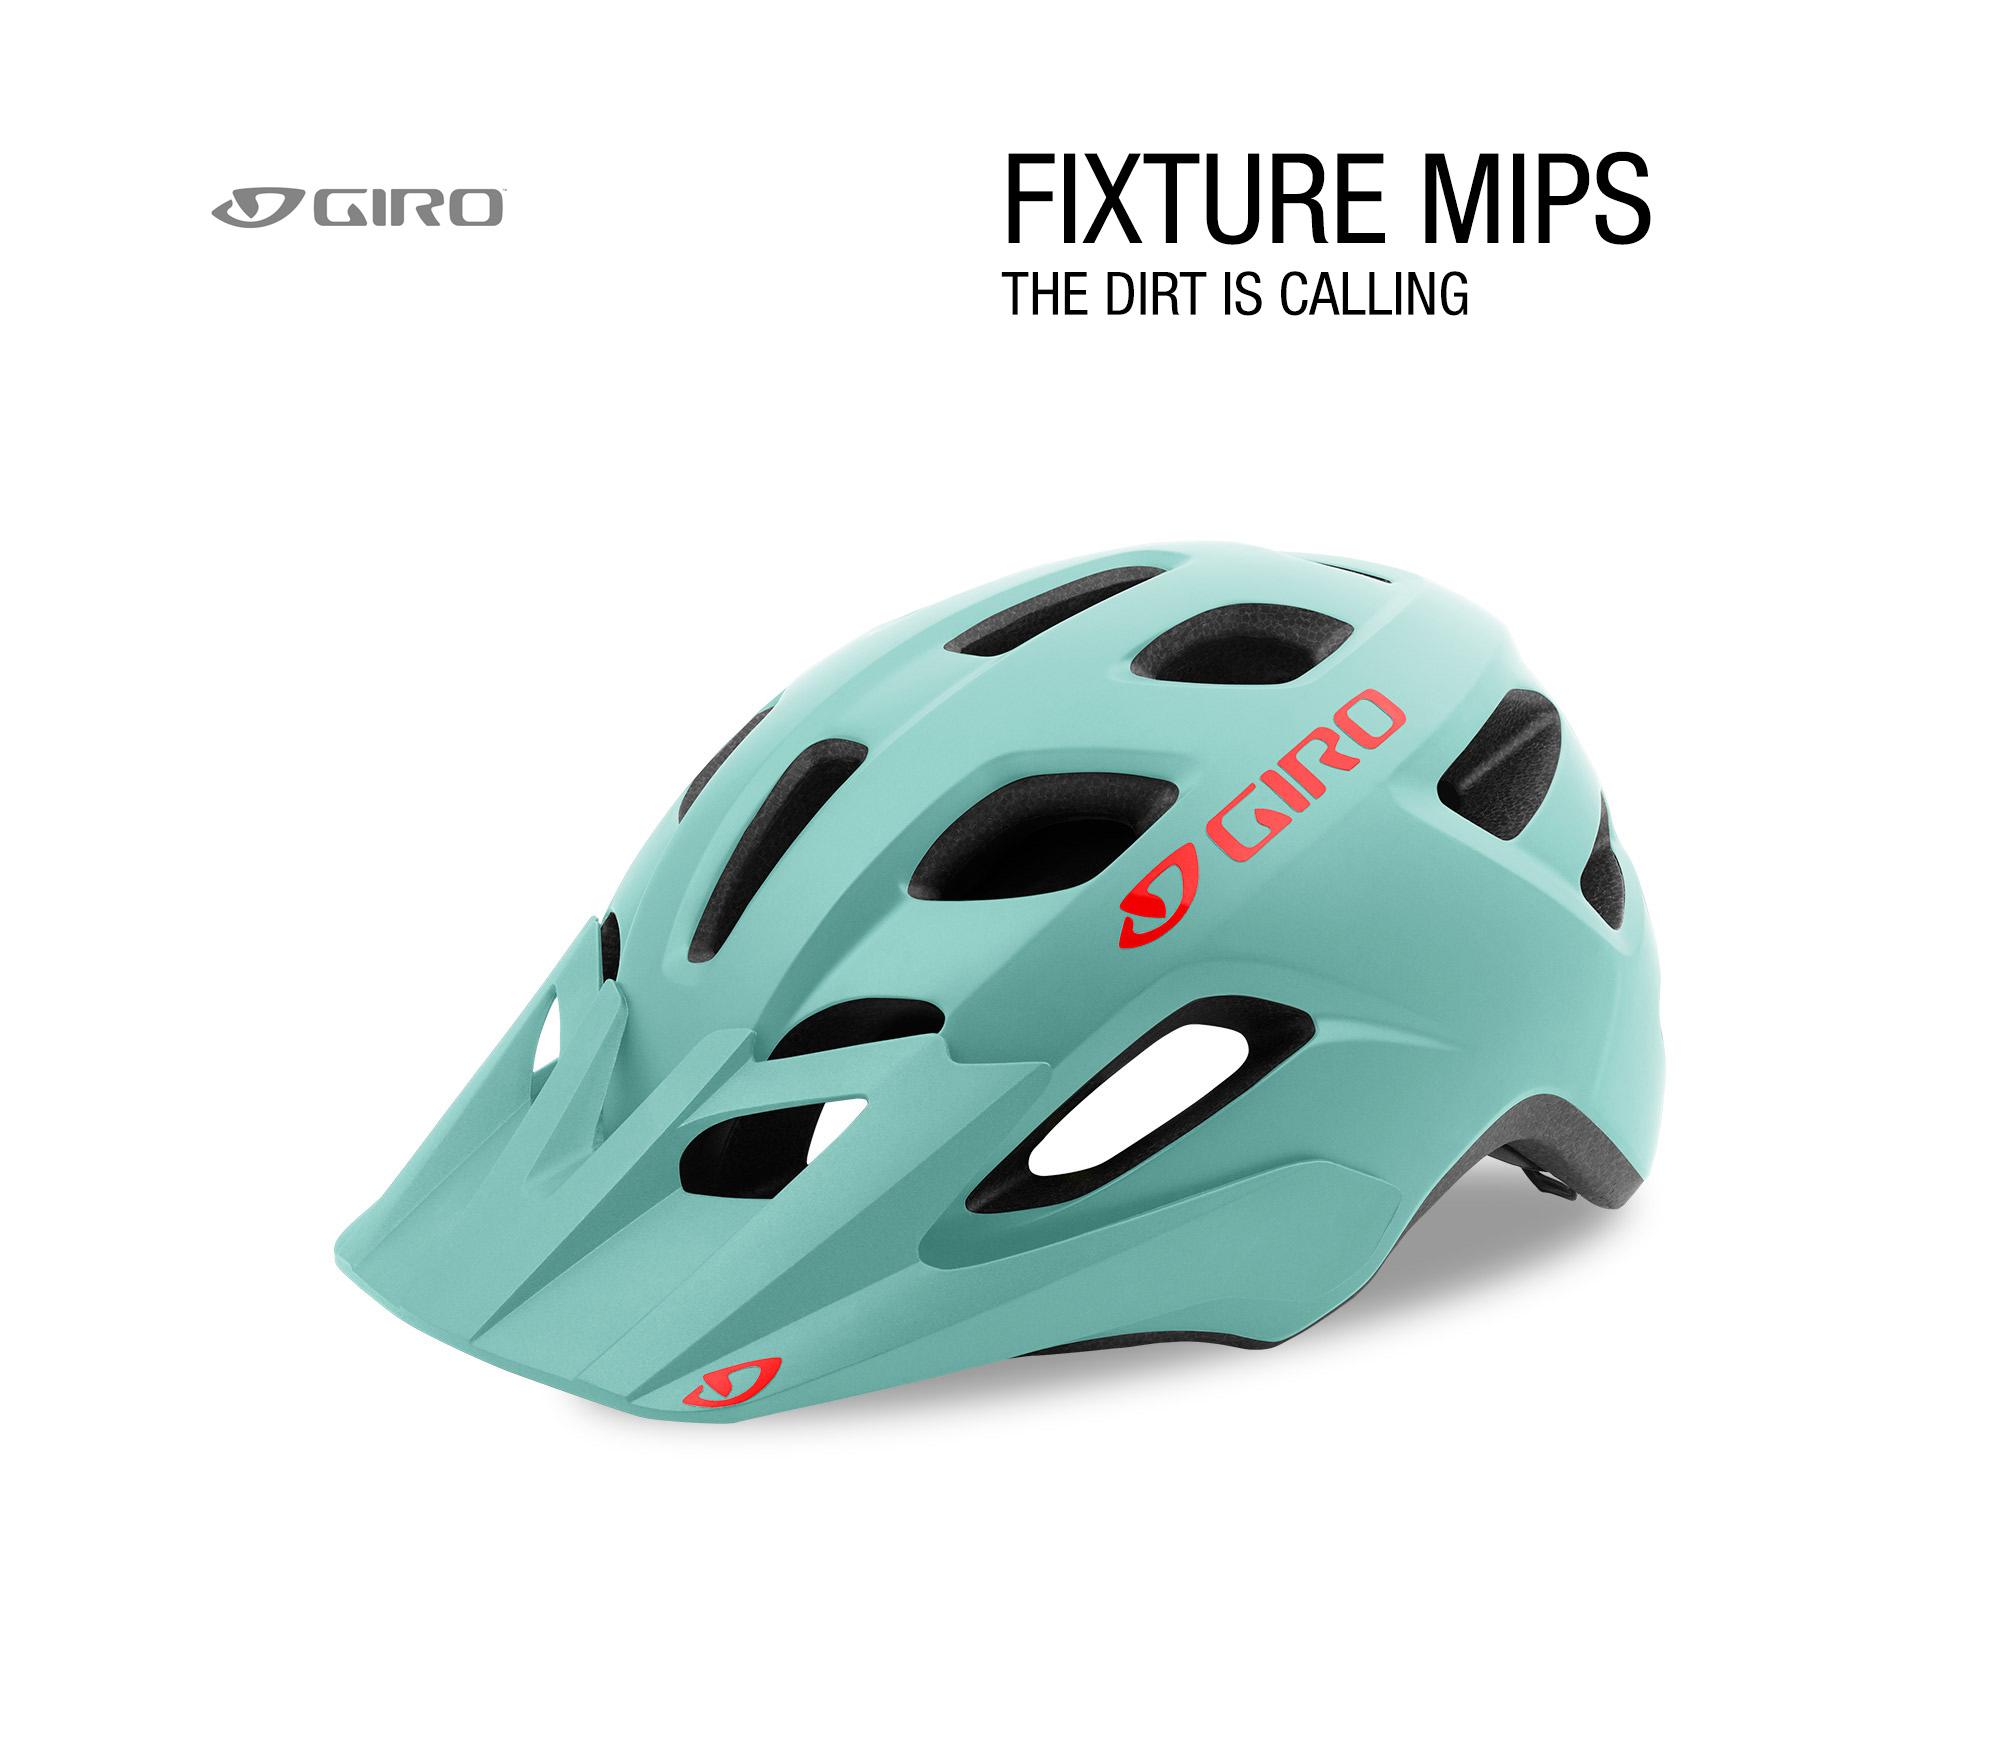 Giro FIXTURE MIPS